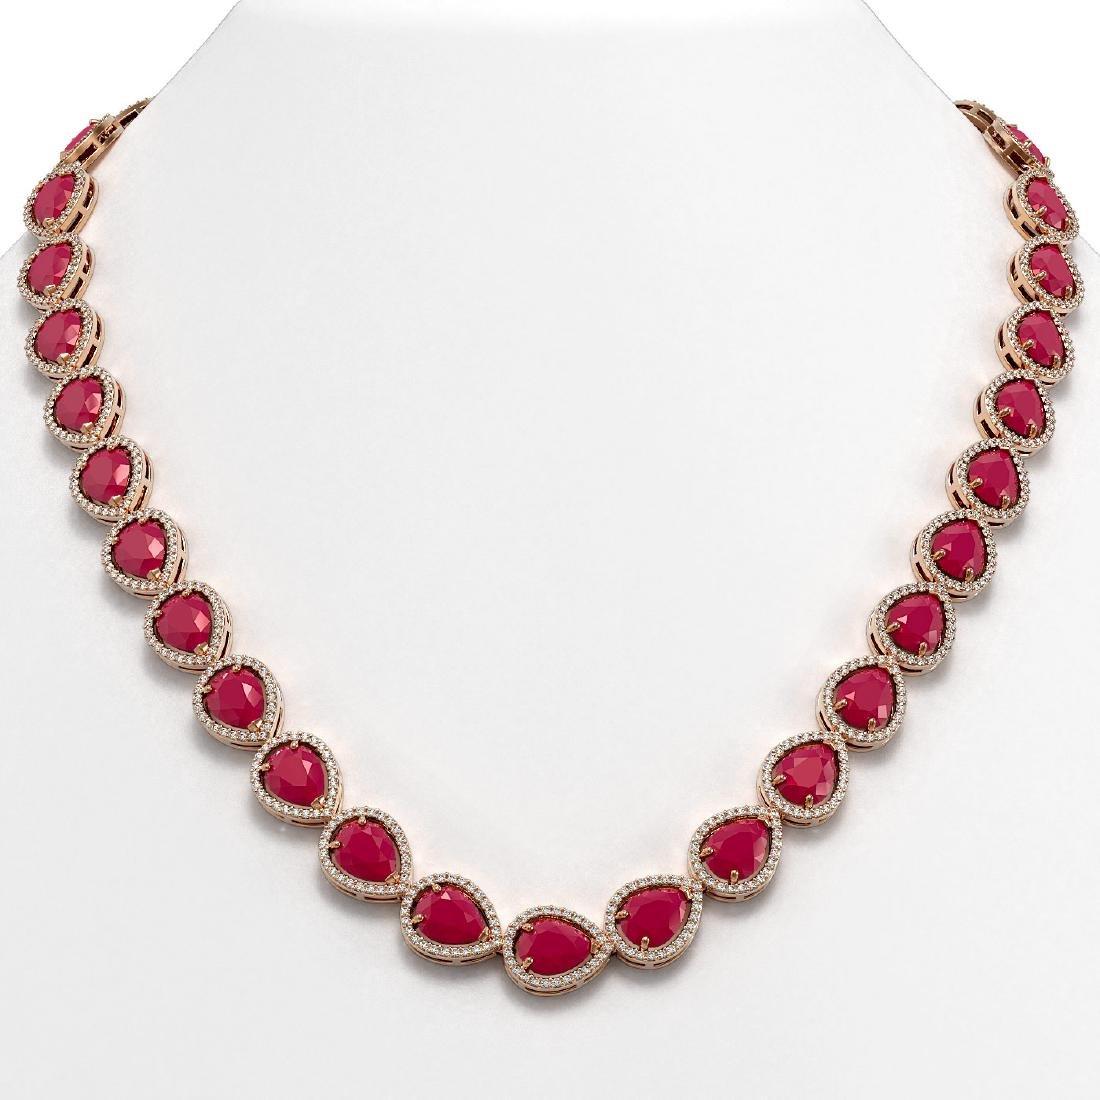 64.01 CTW Ruby & Diamond Halo Necklace 10K Rose Gold